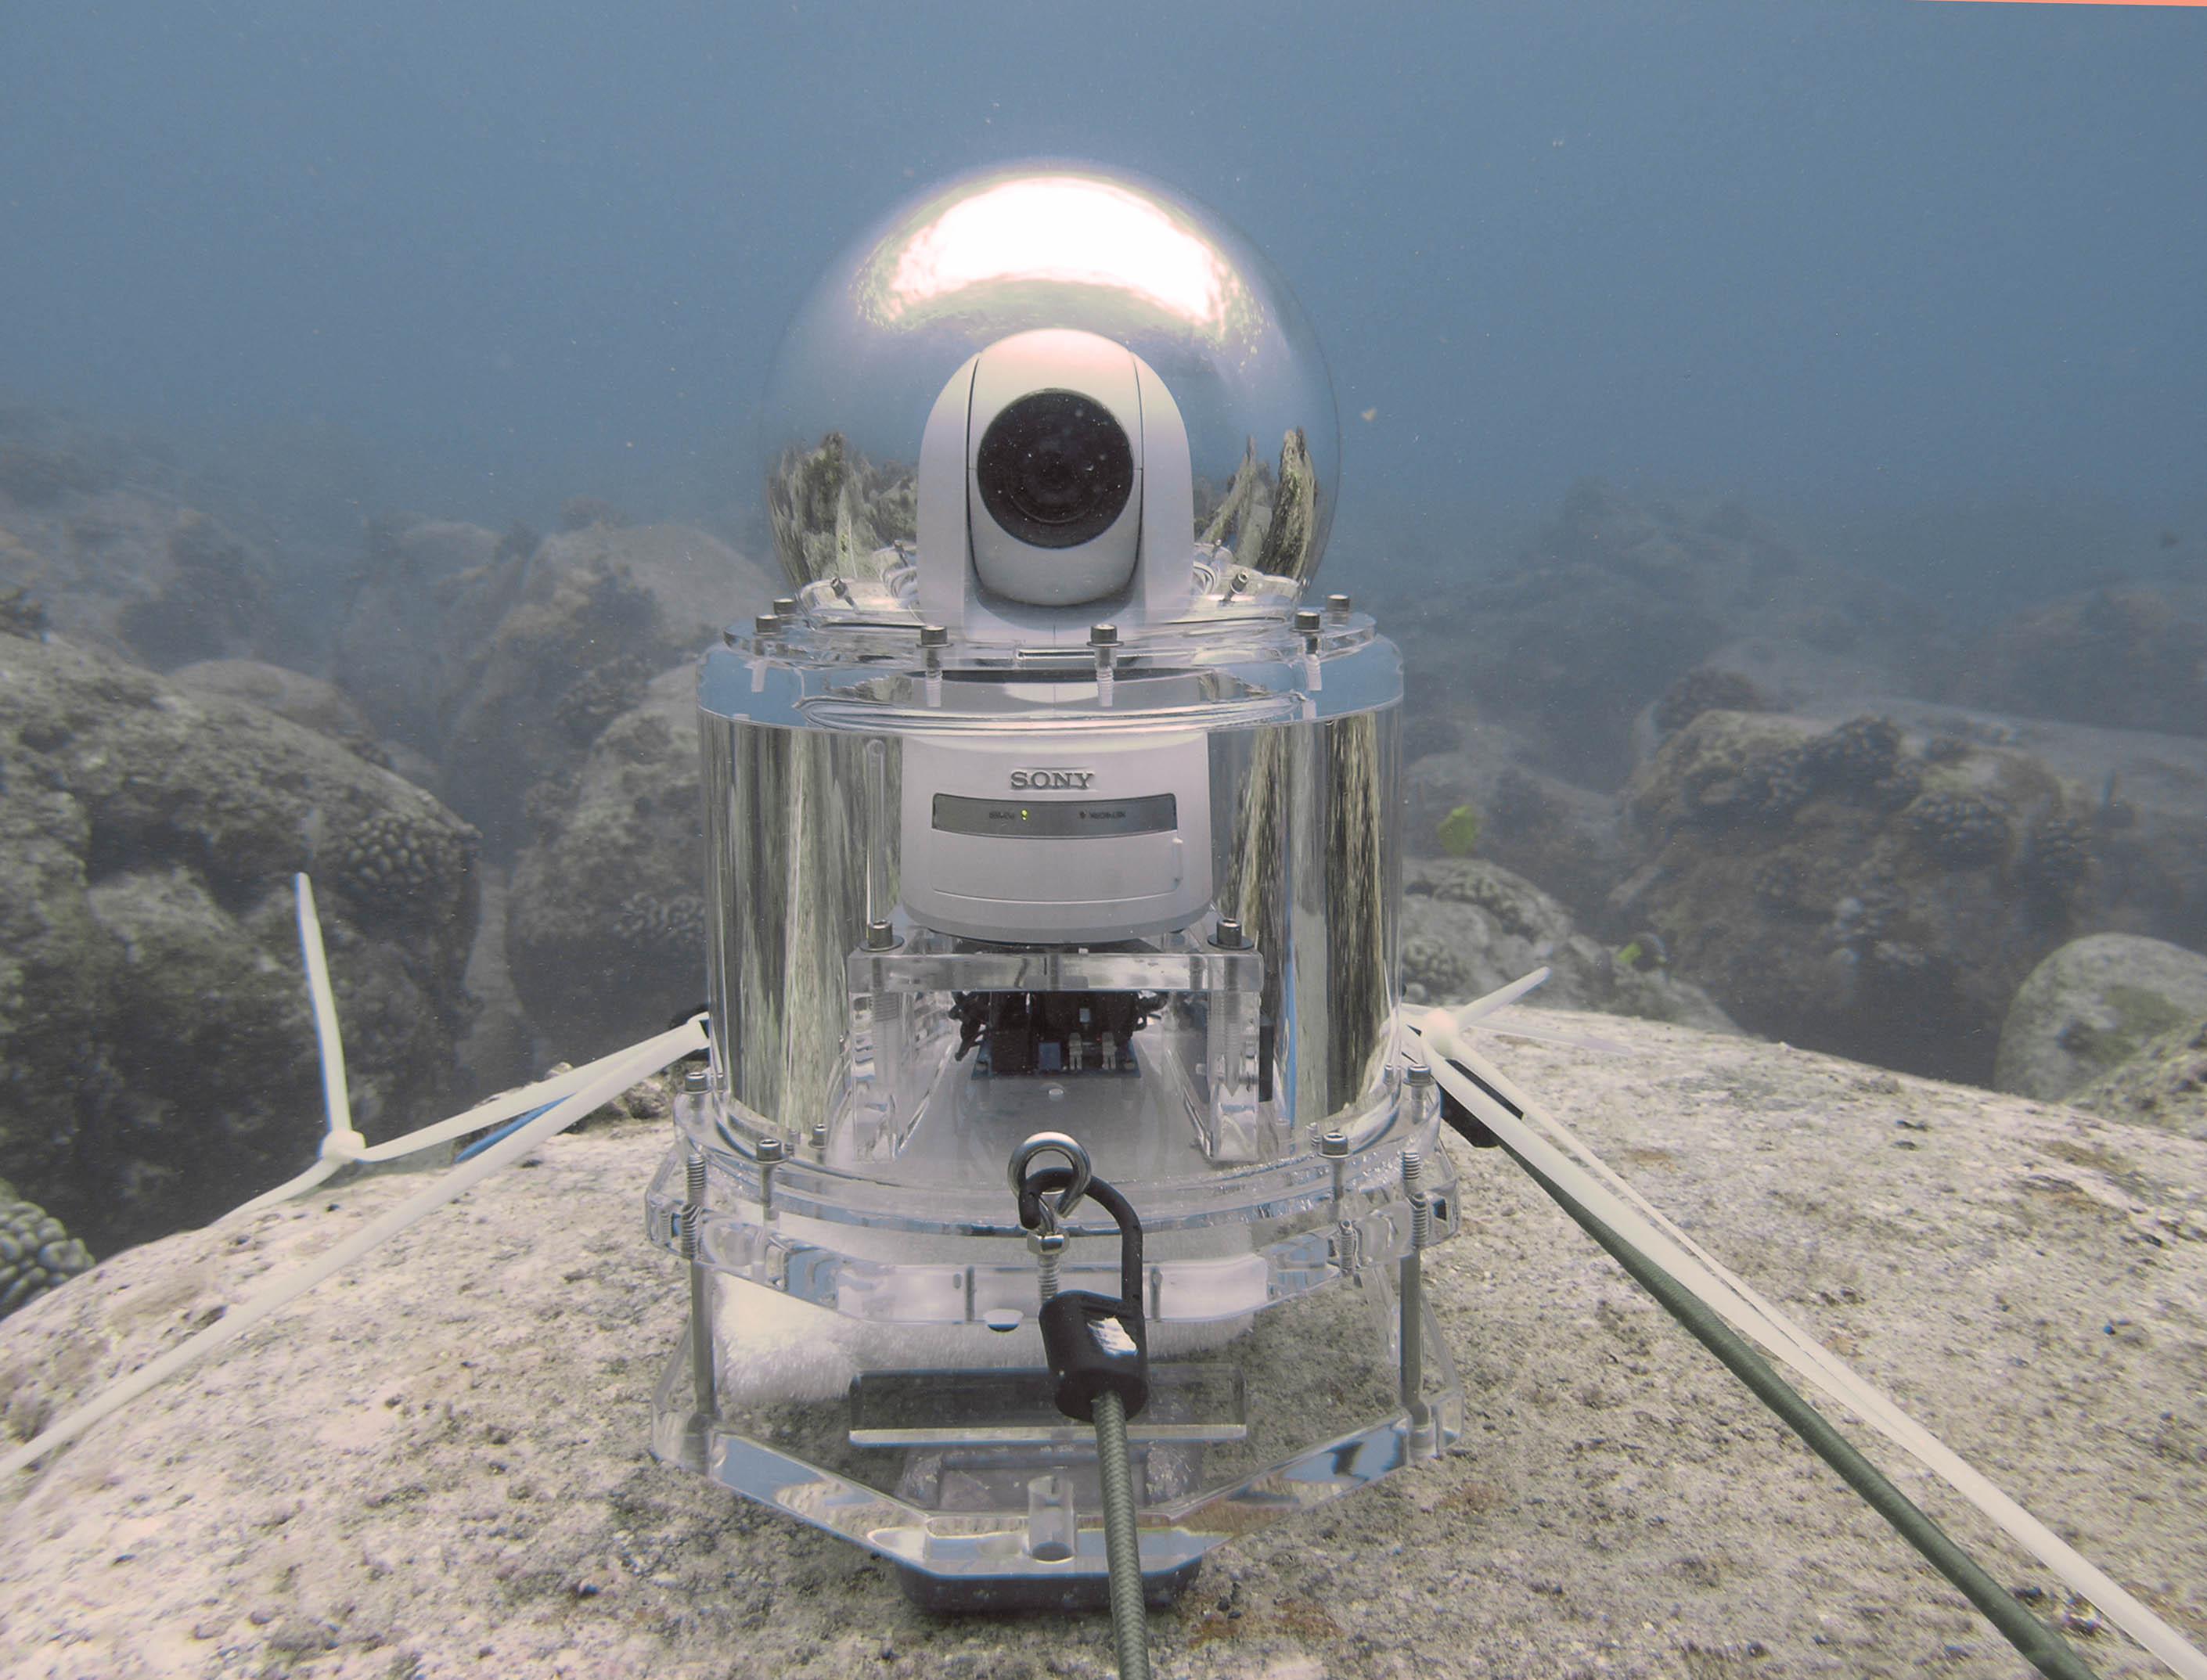 Underwater video camera deployed in Kona, Hawaii